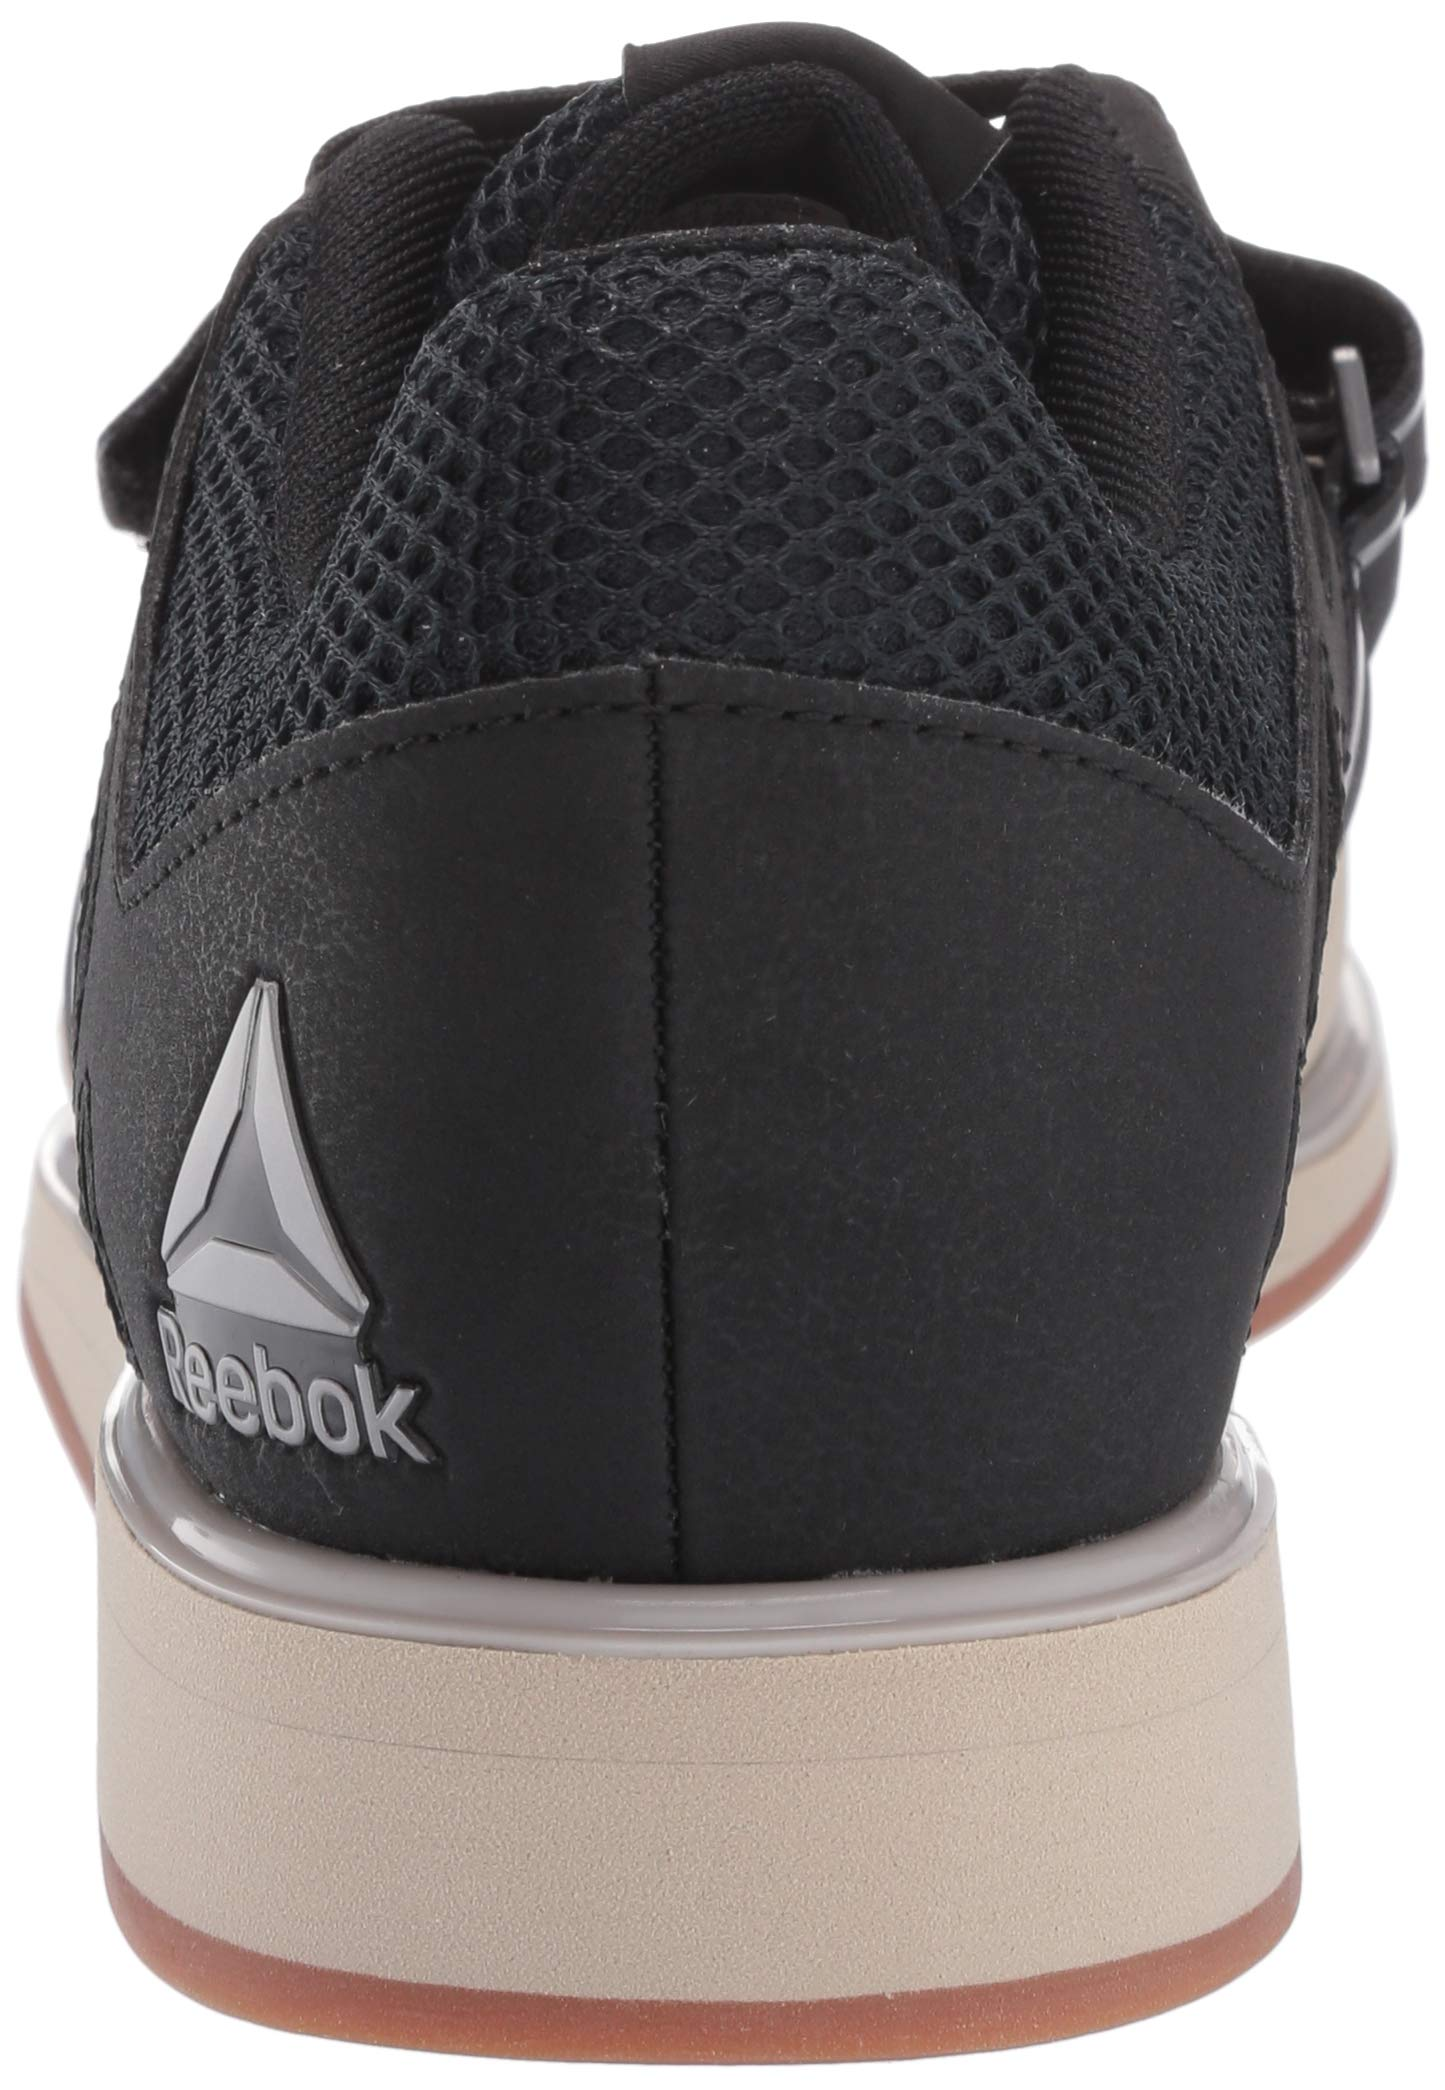 Reebok Men's Lifter PR, Light Sand/Black/Gum/Pewter, 7.5 M US by Reebok (Image #2)